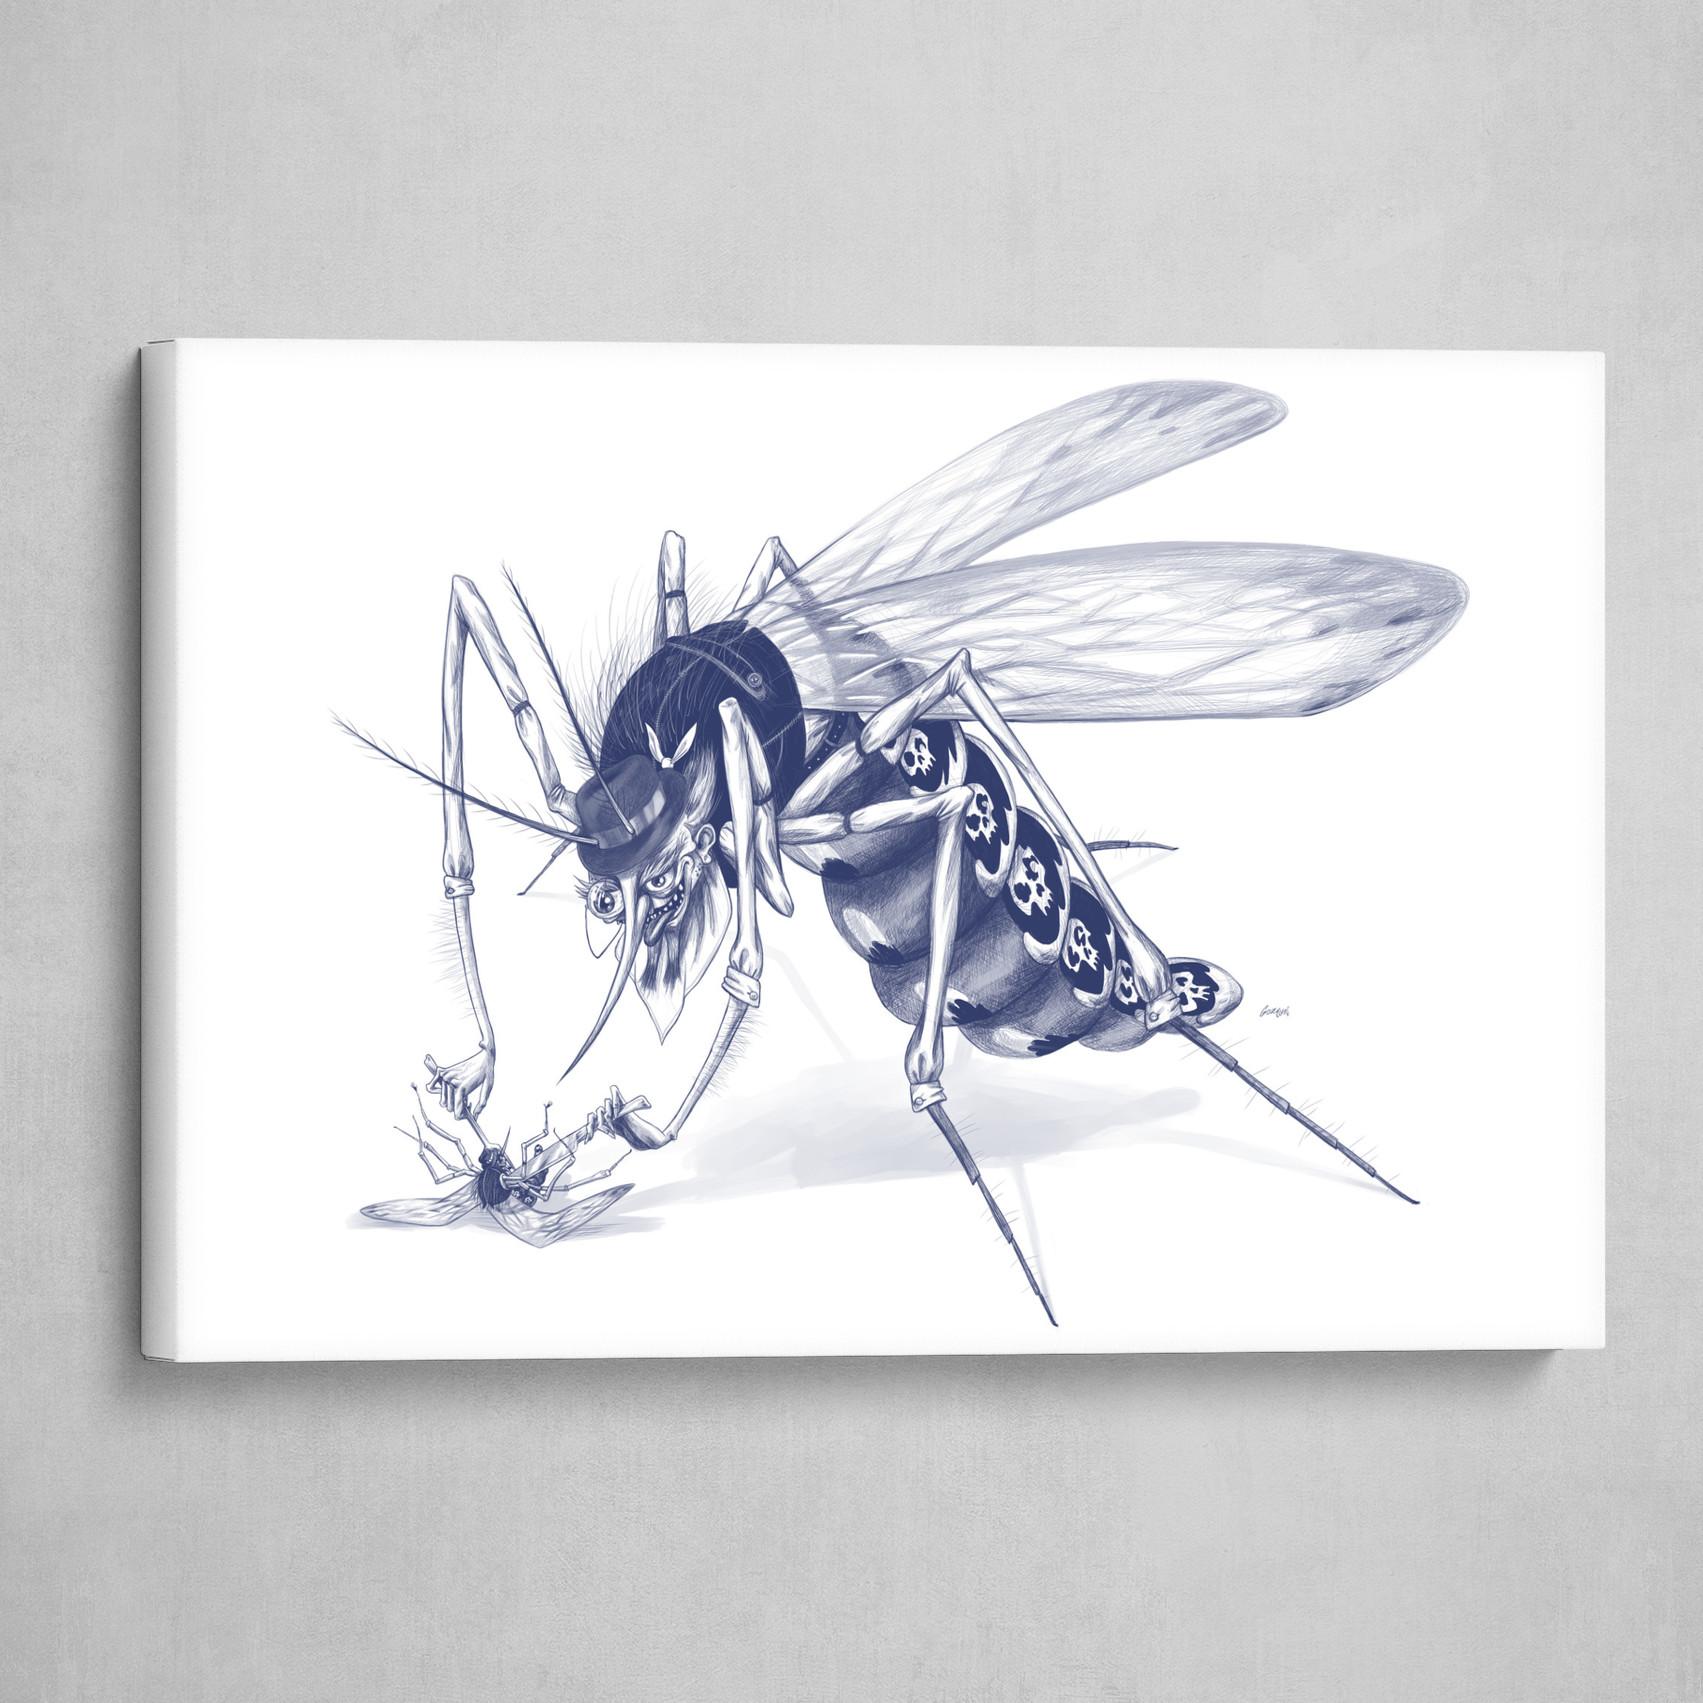 Common sense bug